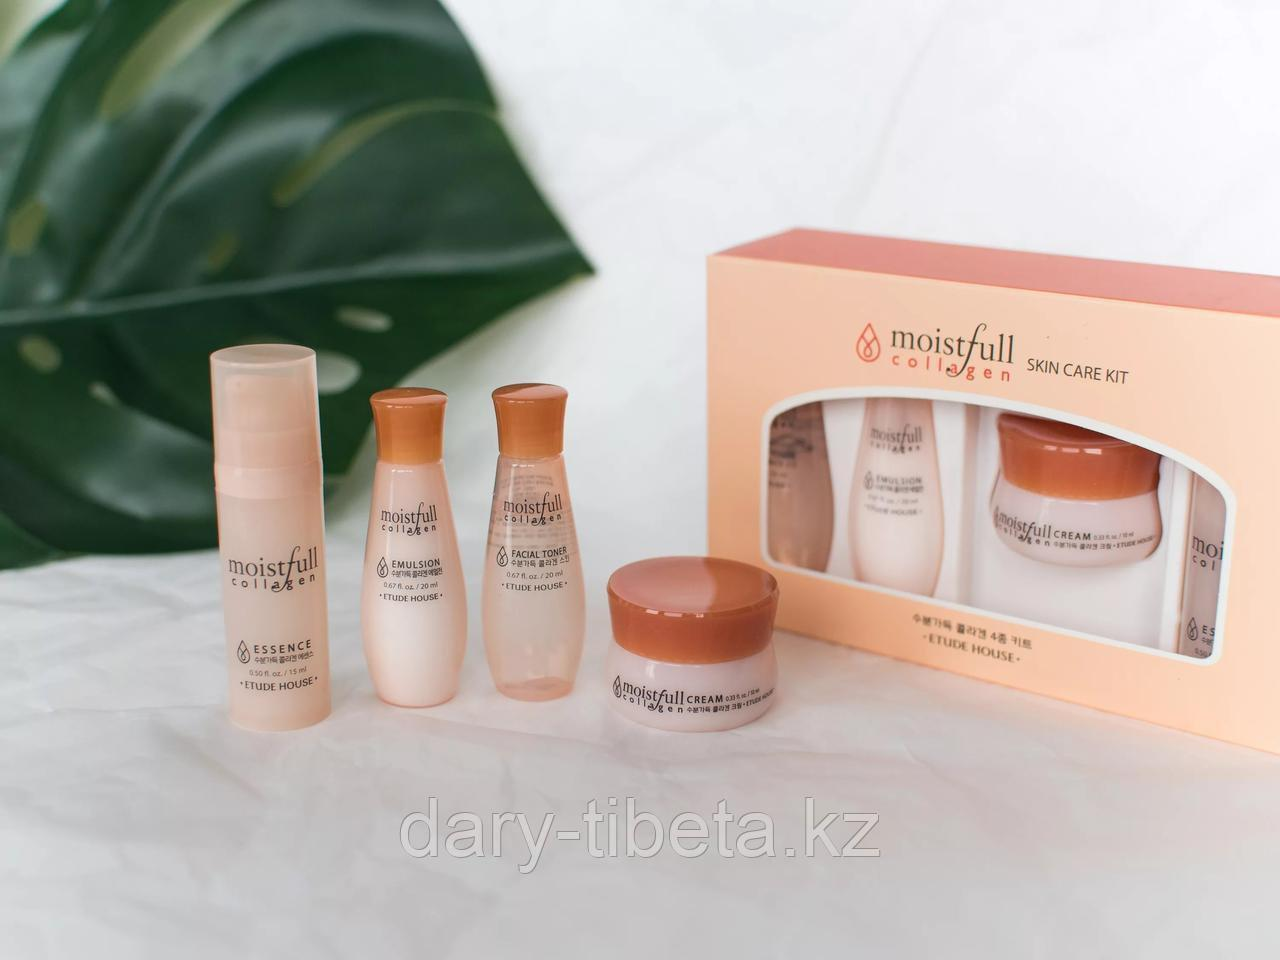 Etude House Moistfull Collagen Skin Care Kit -Мини-набор увлажняющих мини-версий